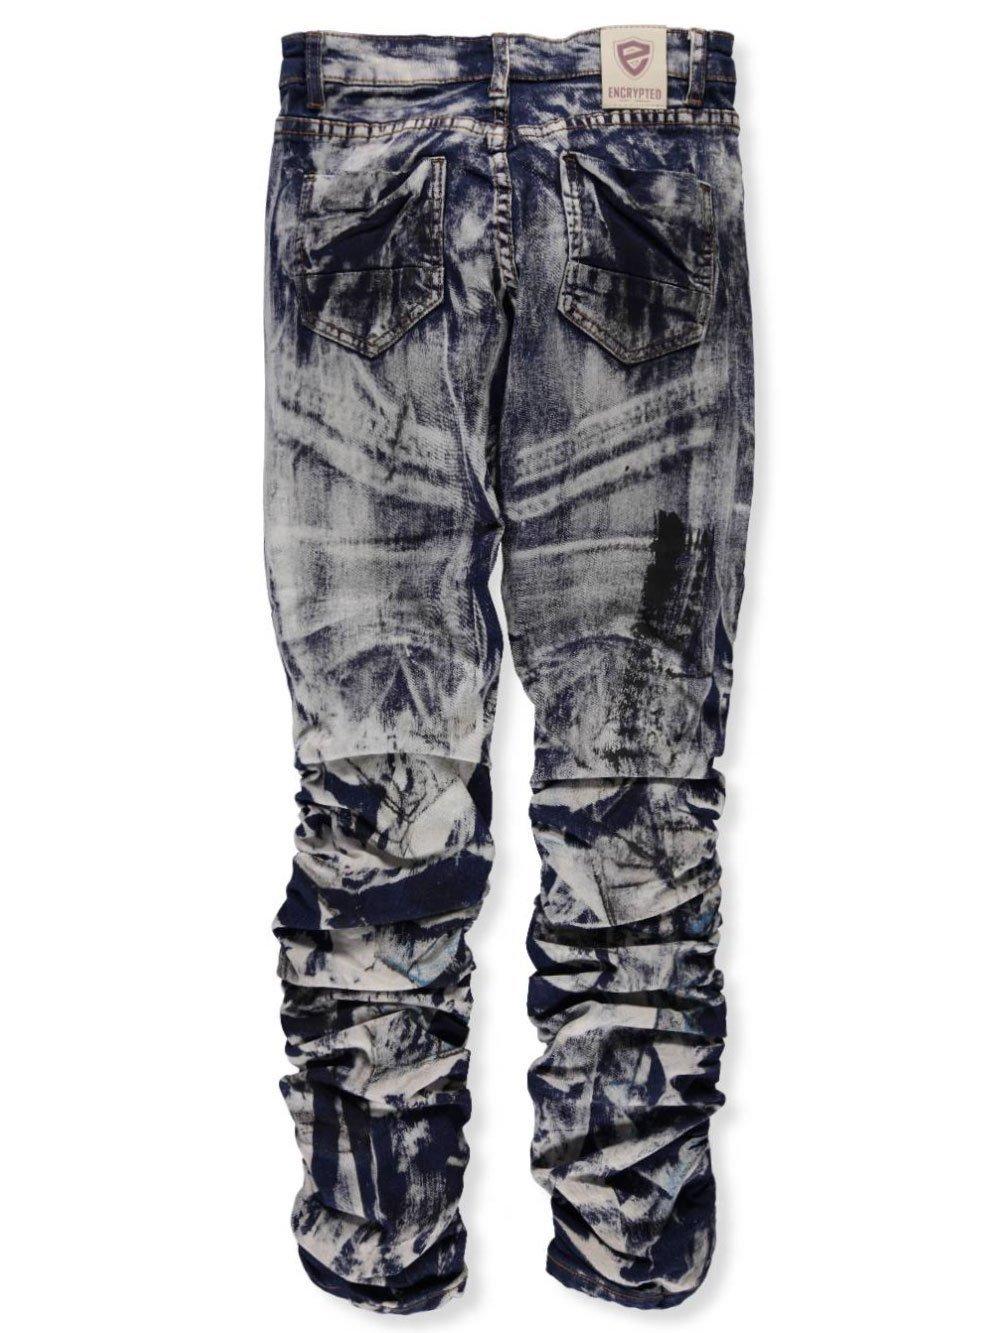 Encrypted Boys' Jeans Encrypted Boys' Jeans